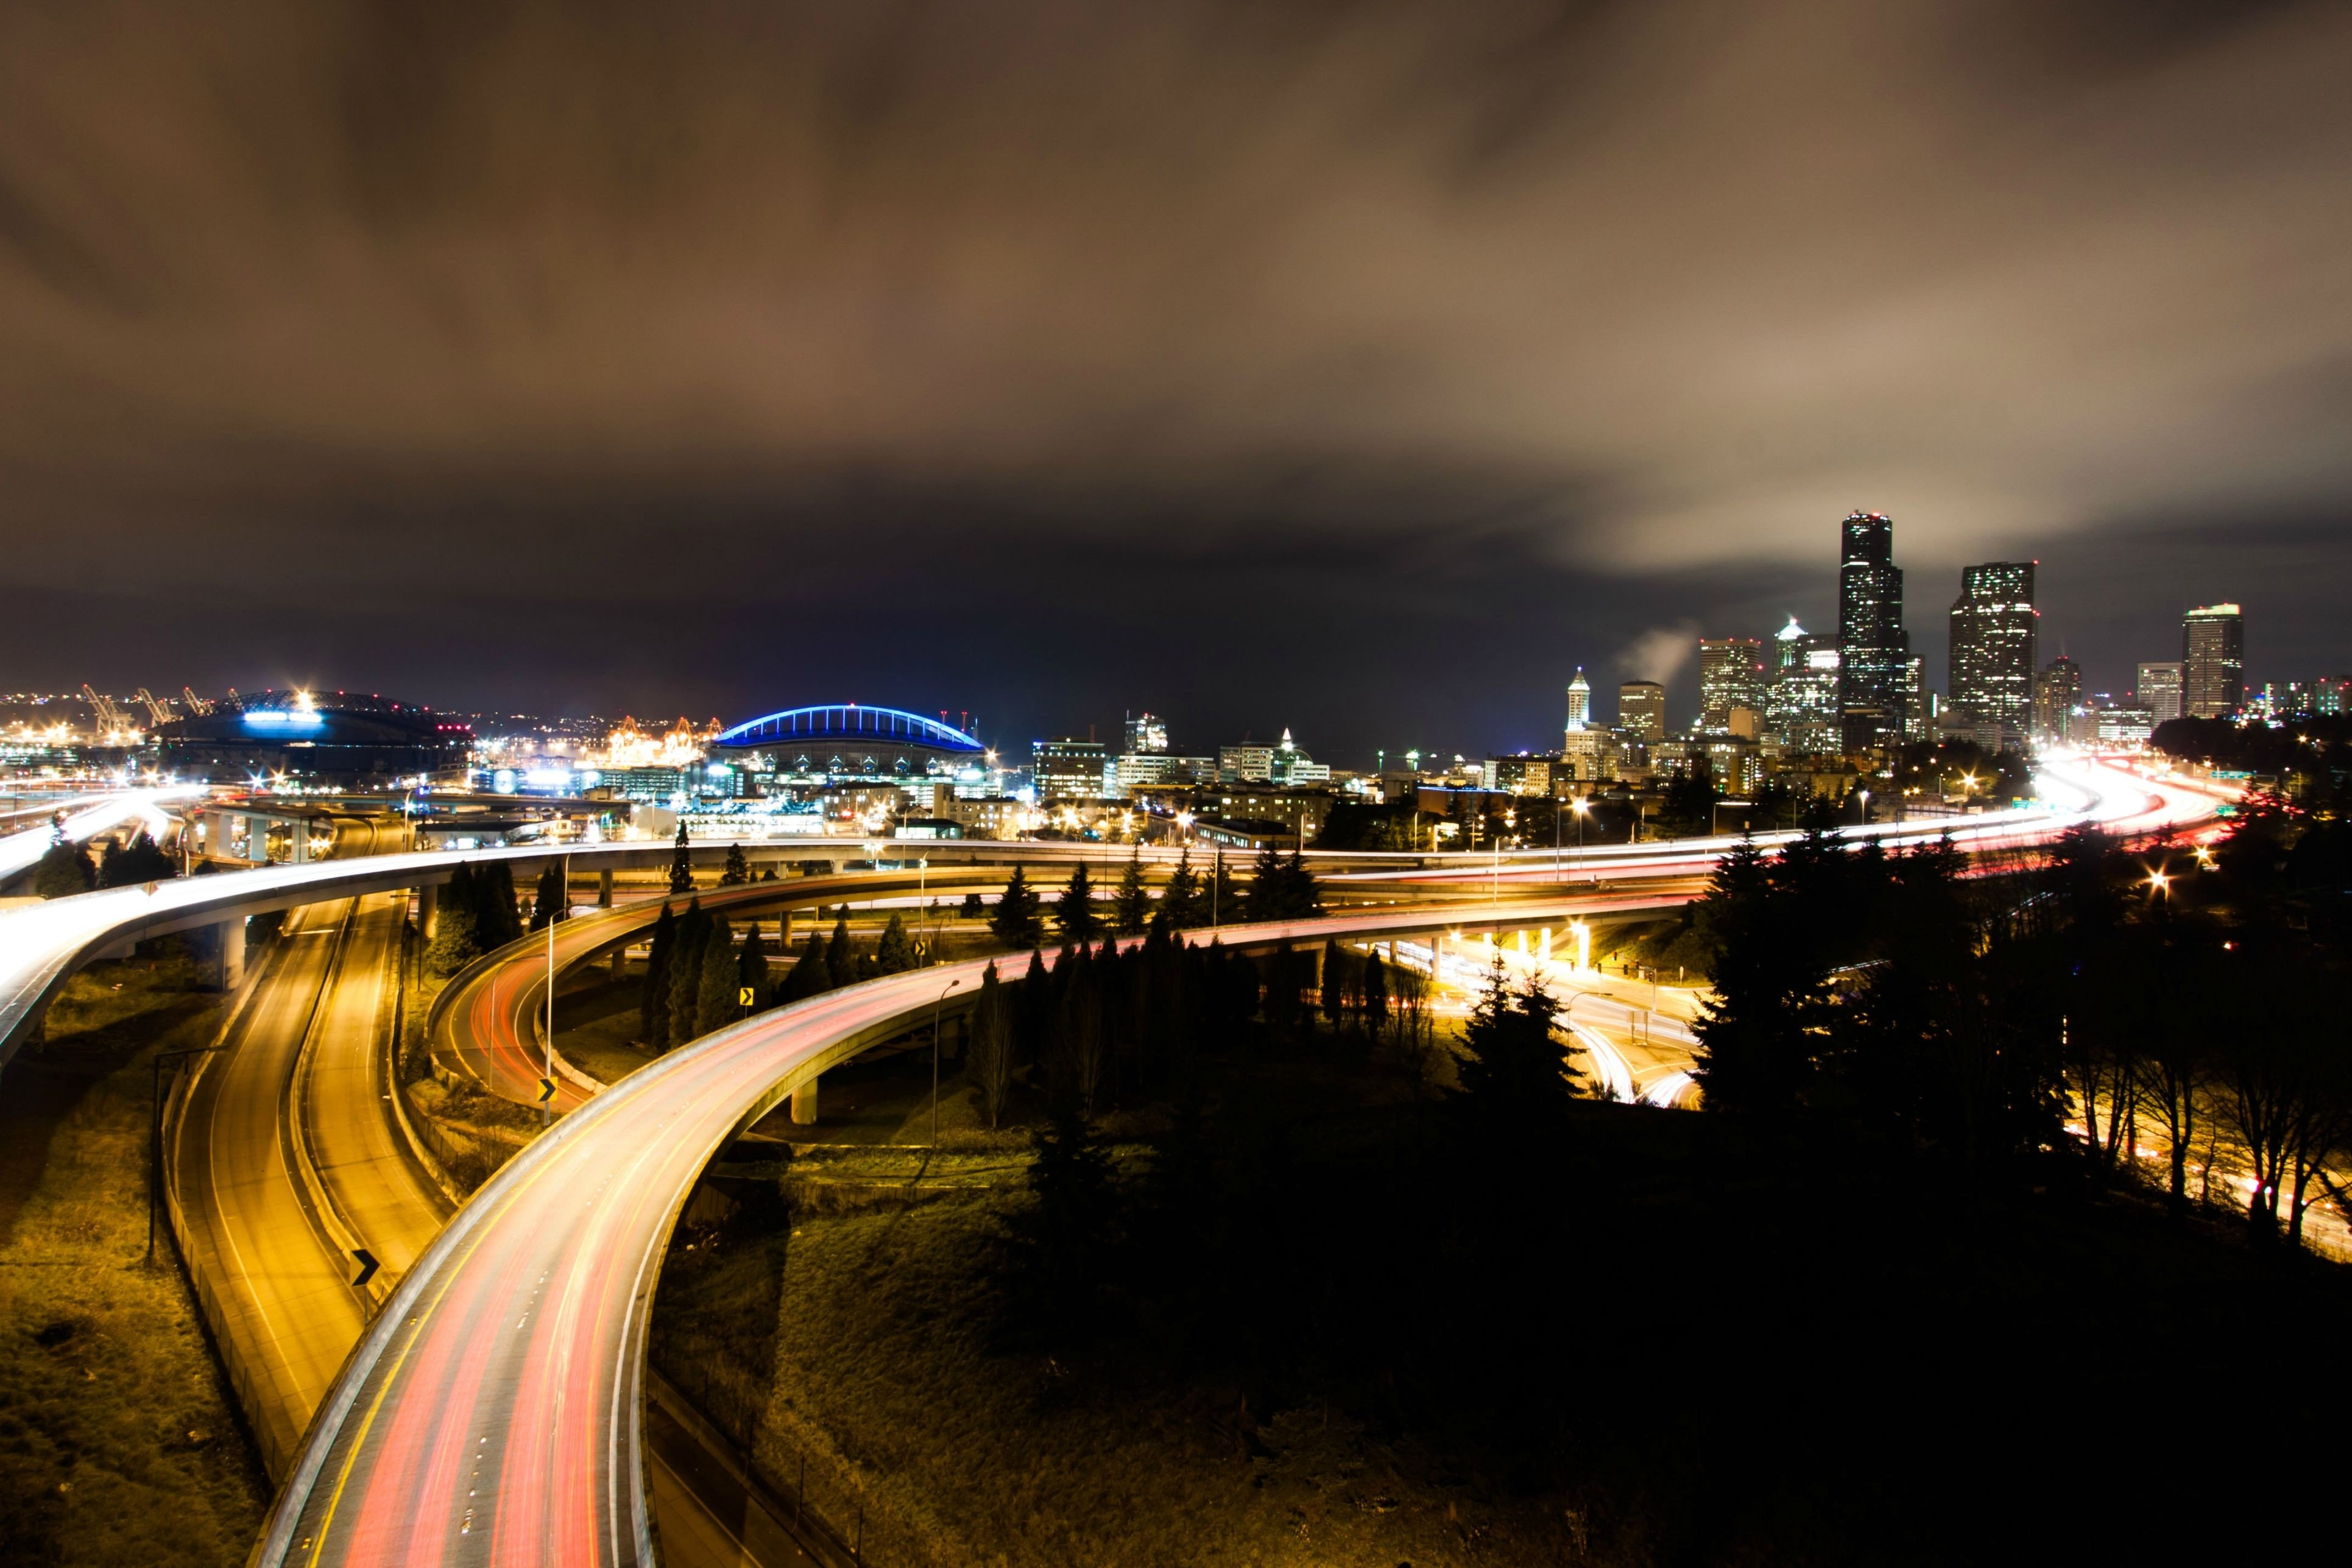 развязка огни ночь мост interchange lights night the bridge бесплатно